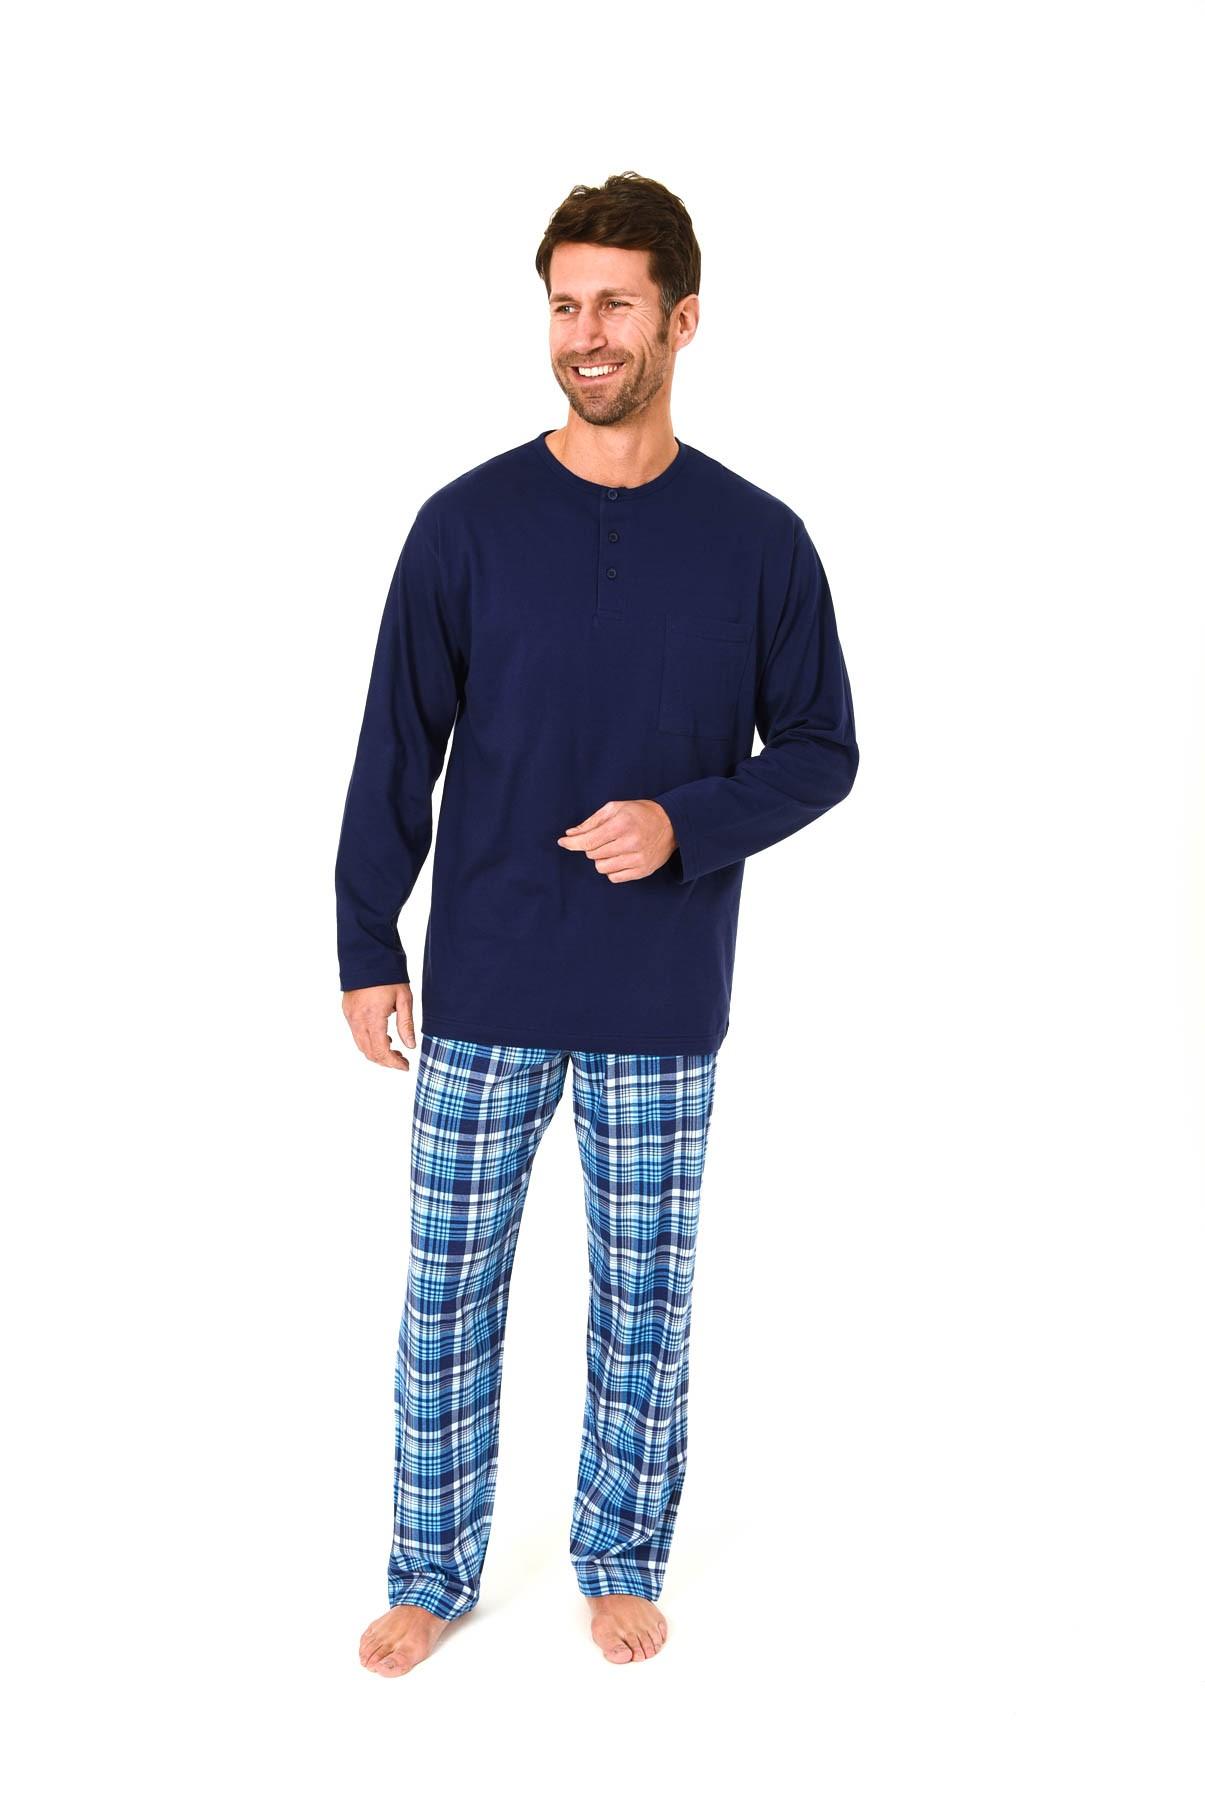 Lässiger Herren Pyjama langarm karierte Hose aus Single Jersey – 58557 001